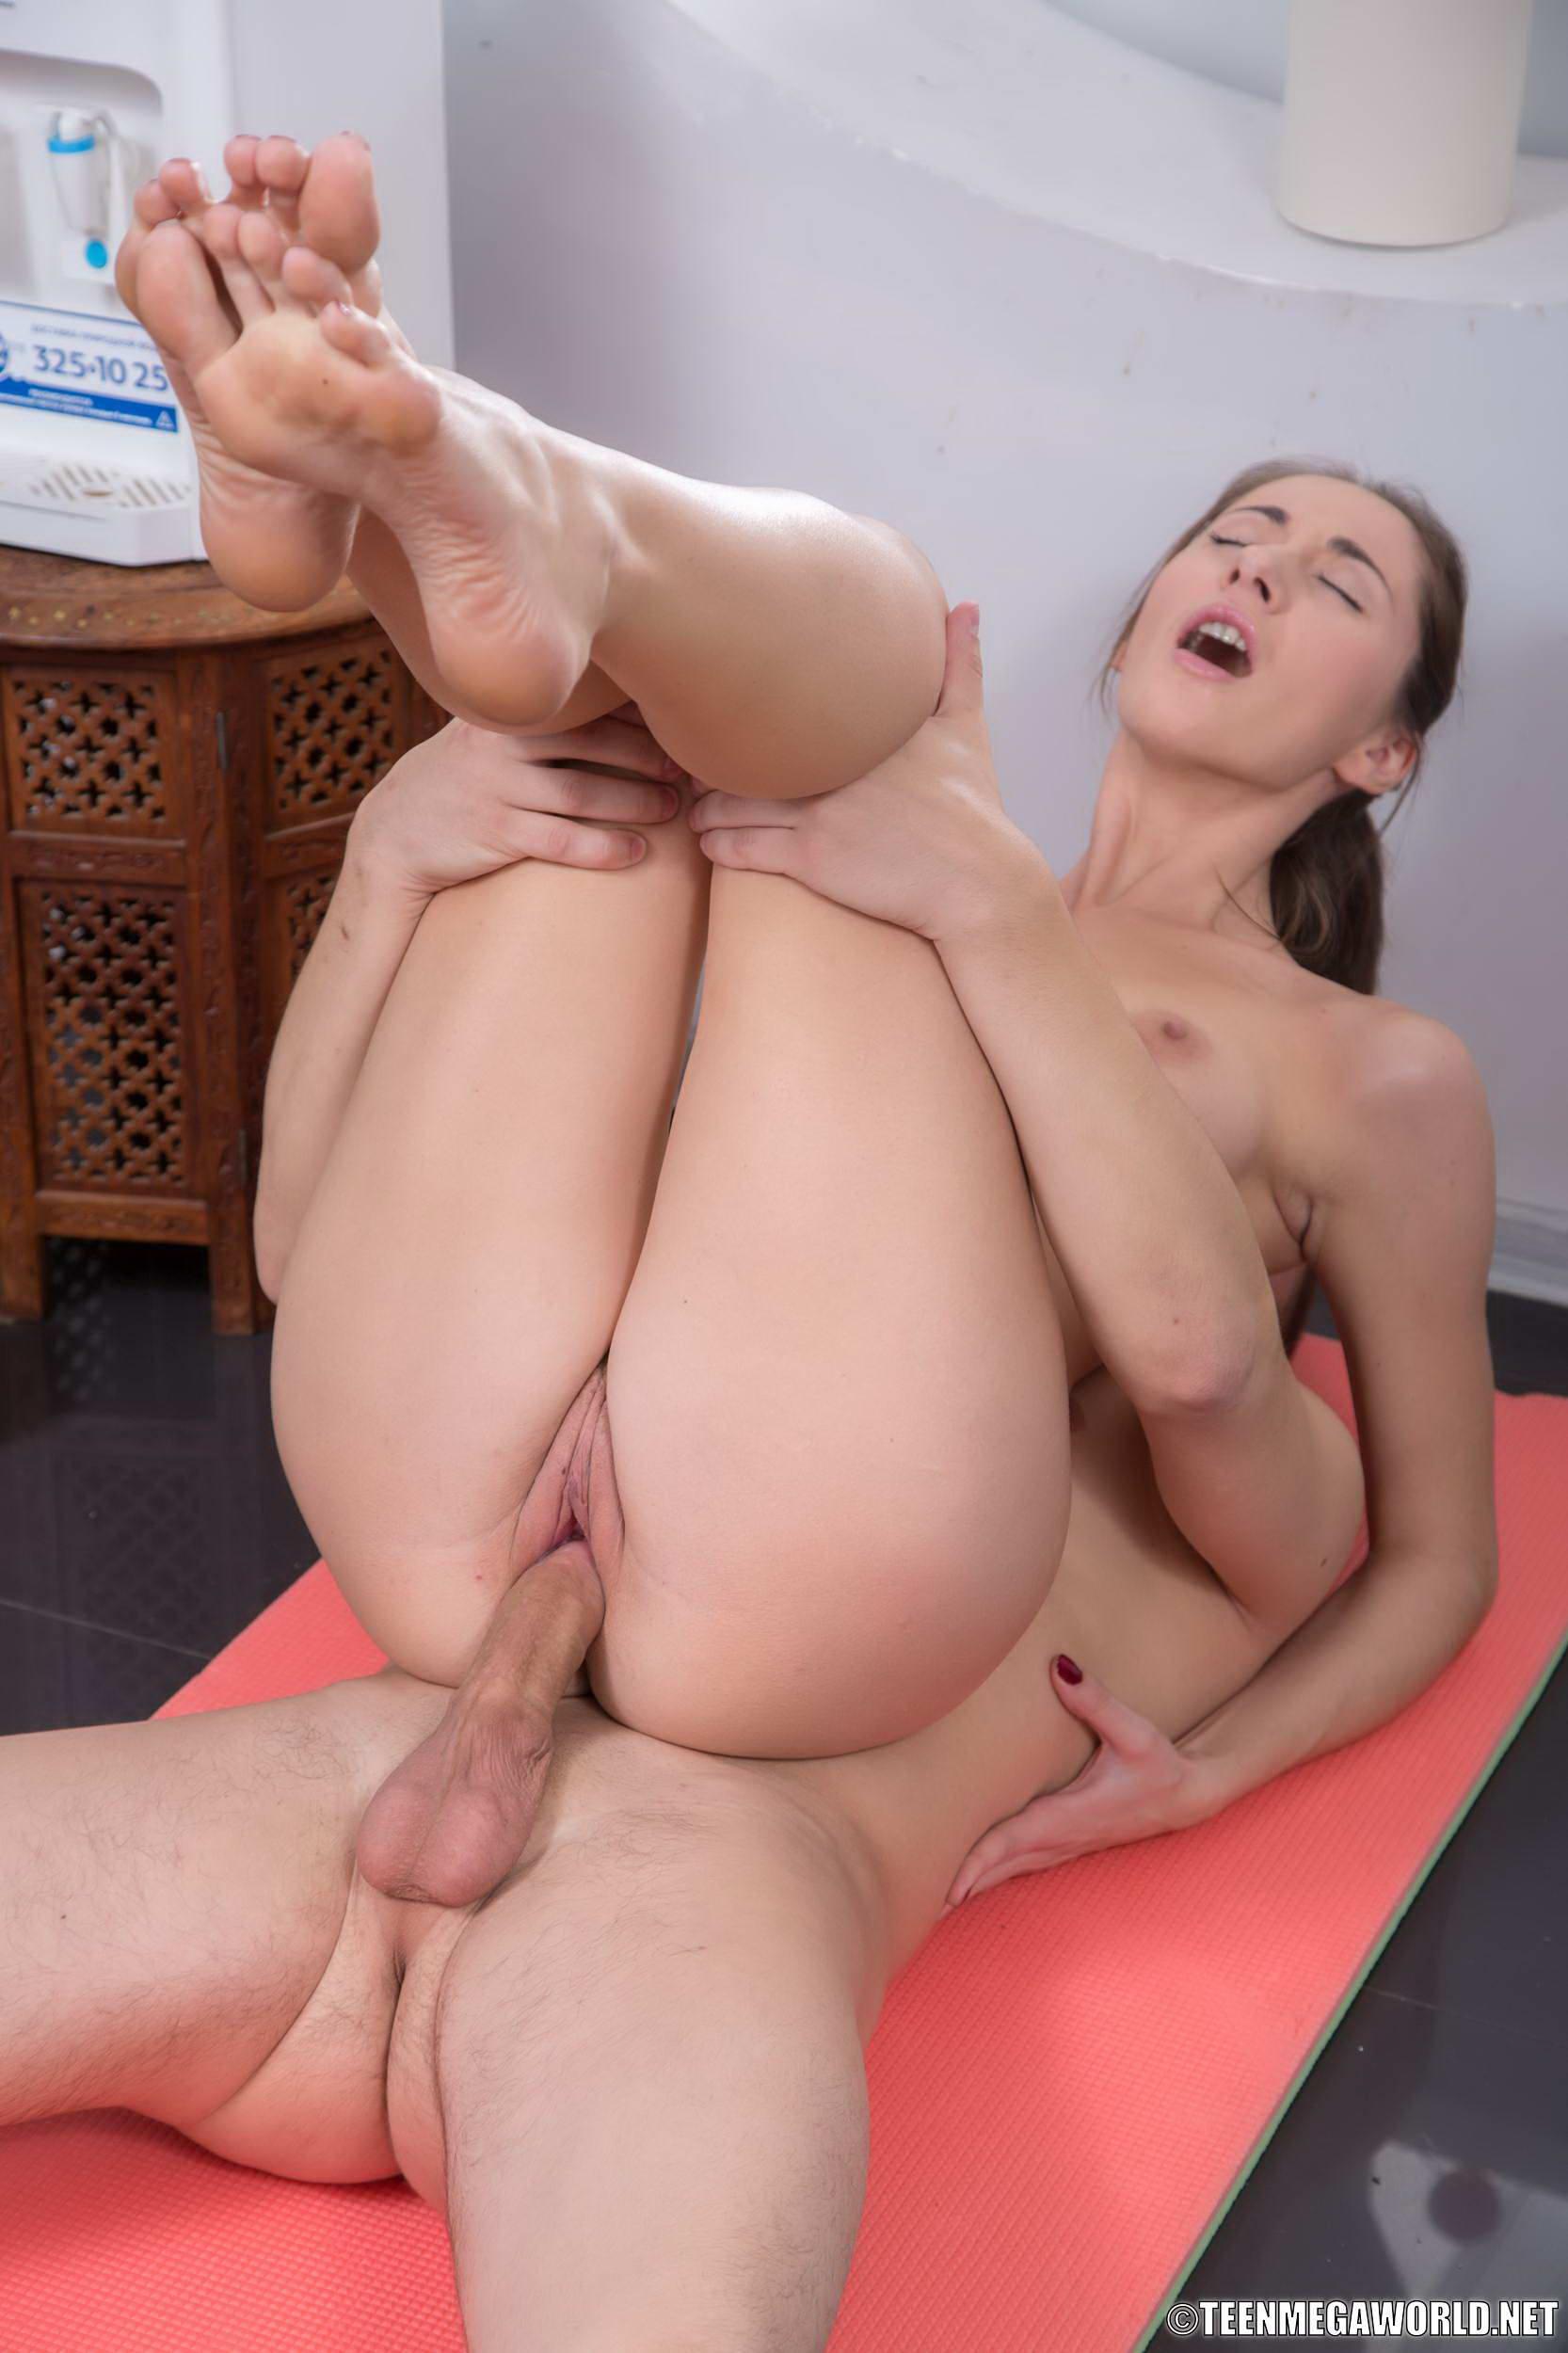 Dirty girls fucking Porn